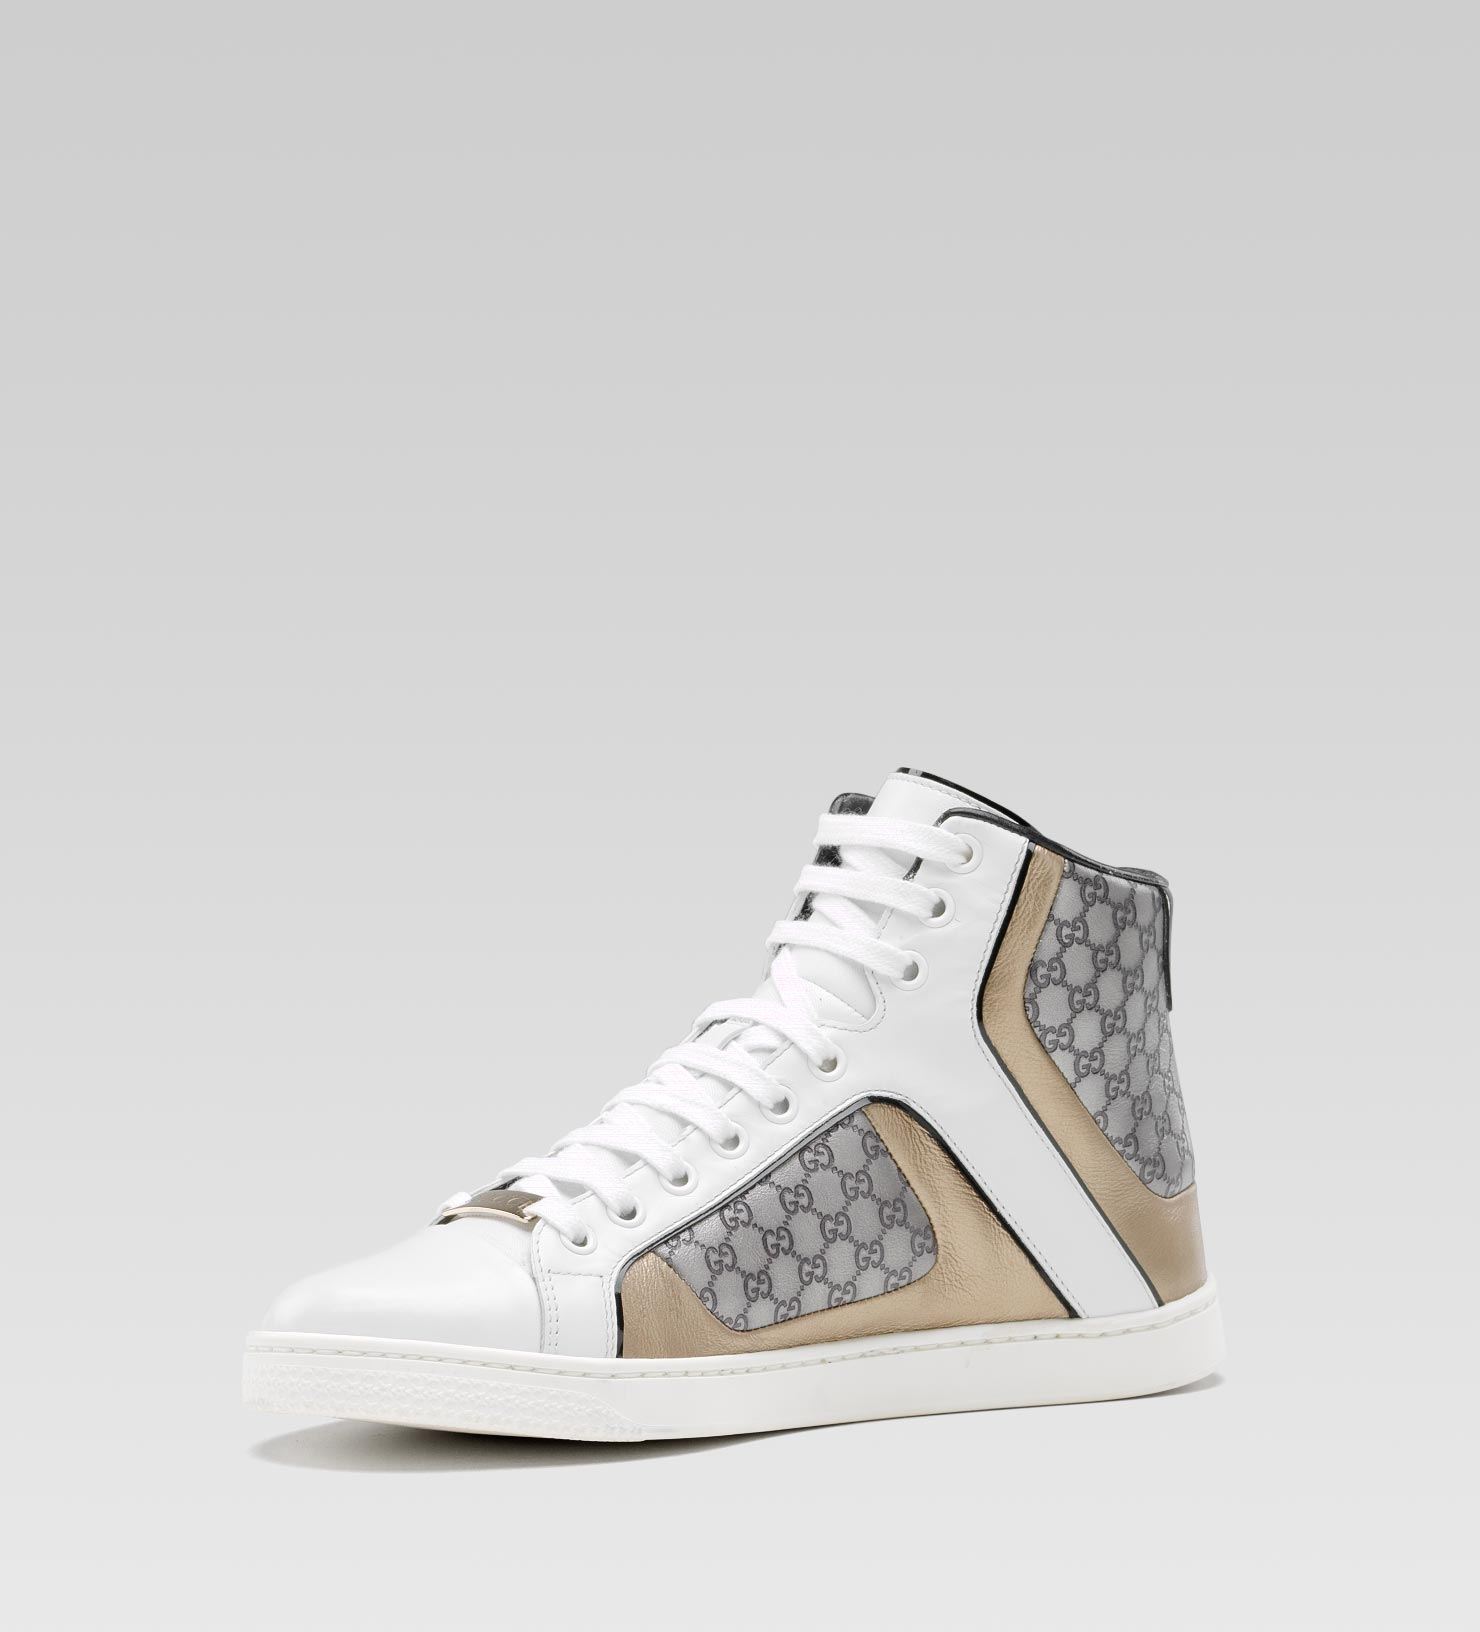 269cd92b116 Hot Pink Gucci Coda Sneakers - Best Sneakers 2018